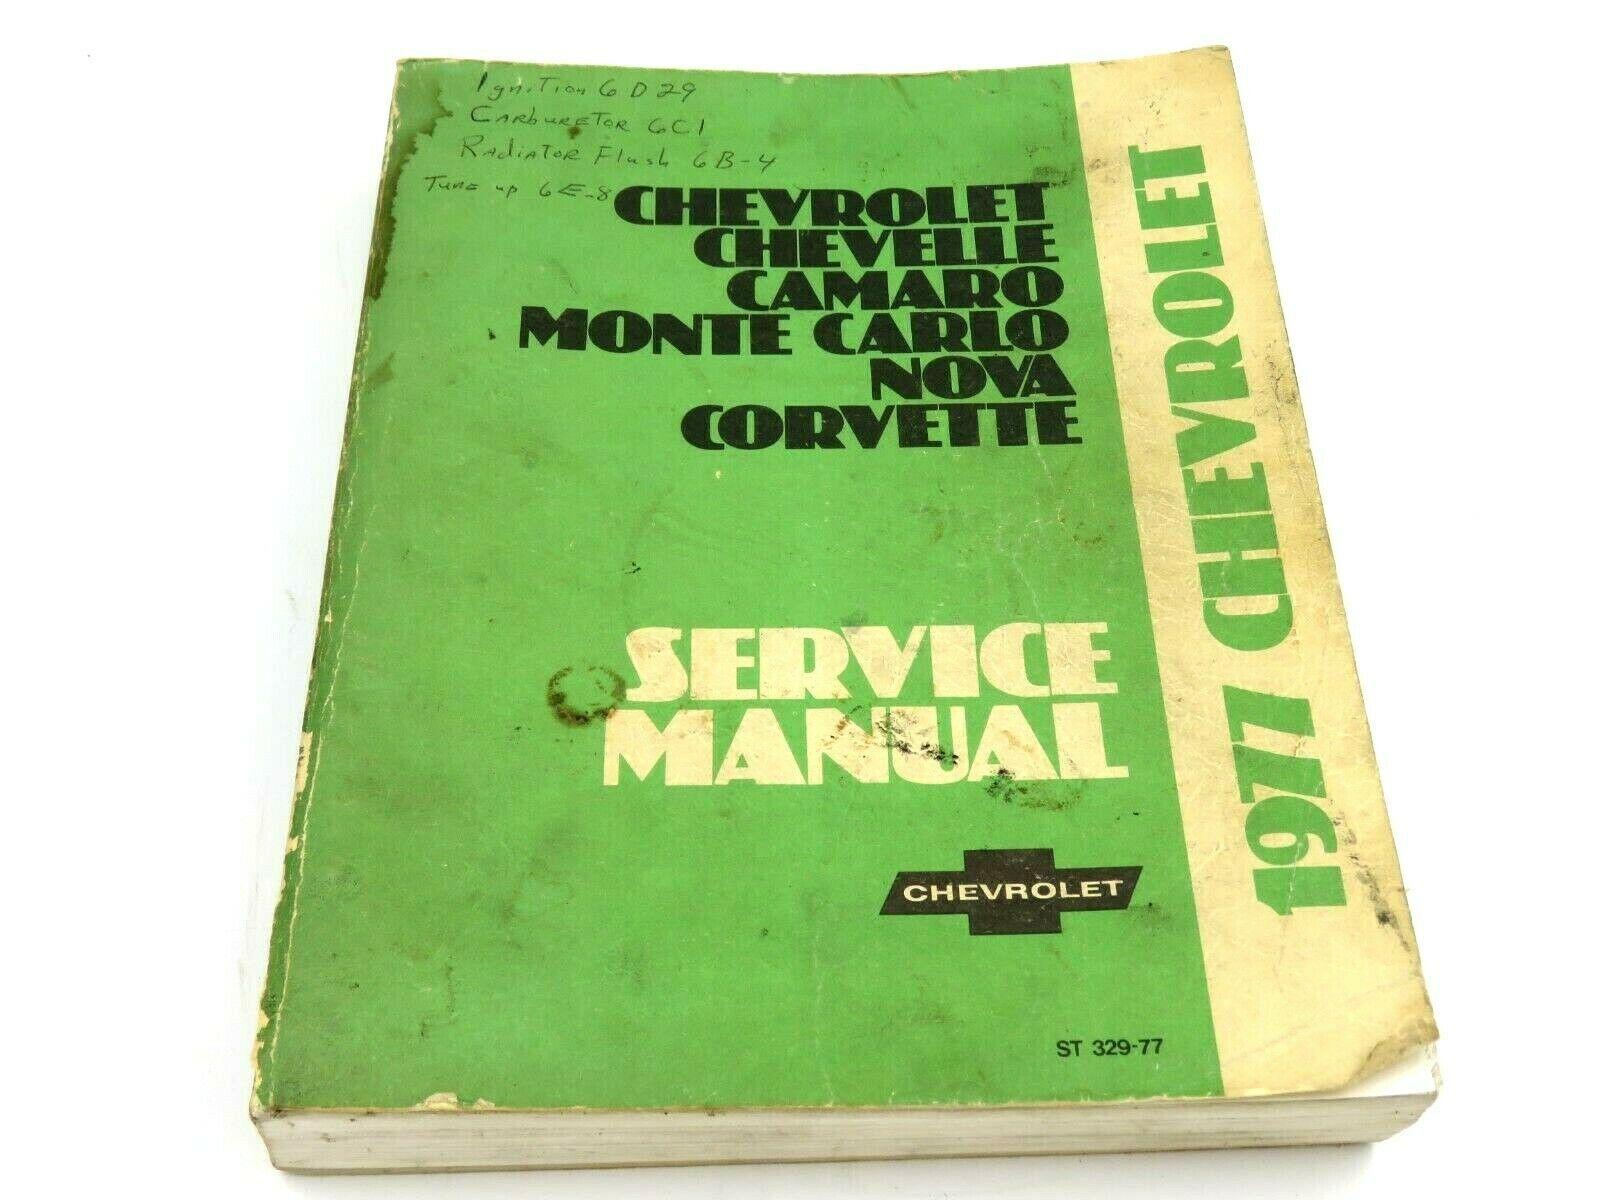 1977 Chevrolet Service Manual ST 329-77 - $22.95